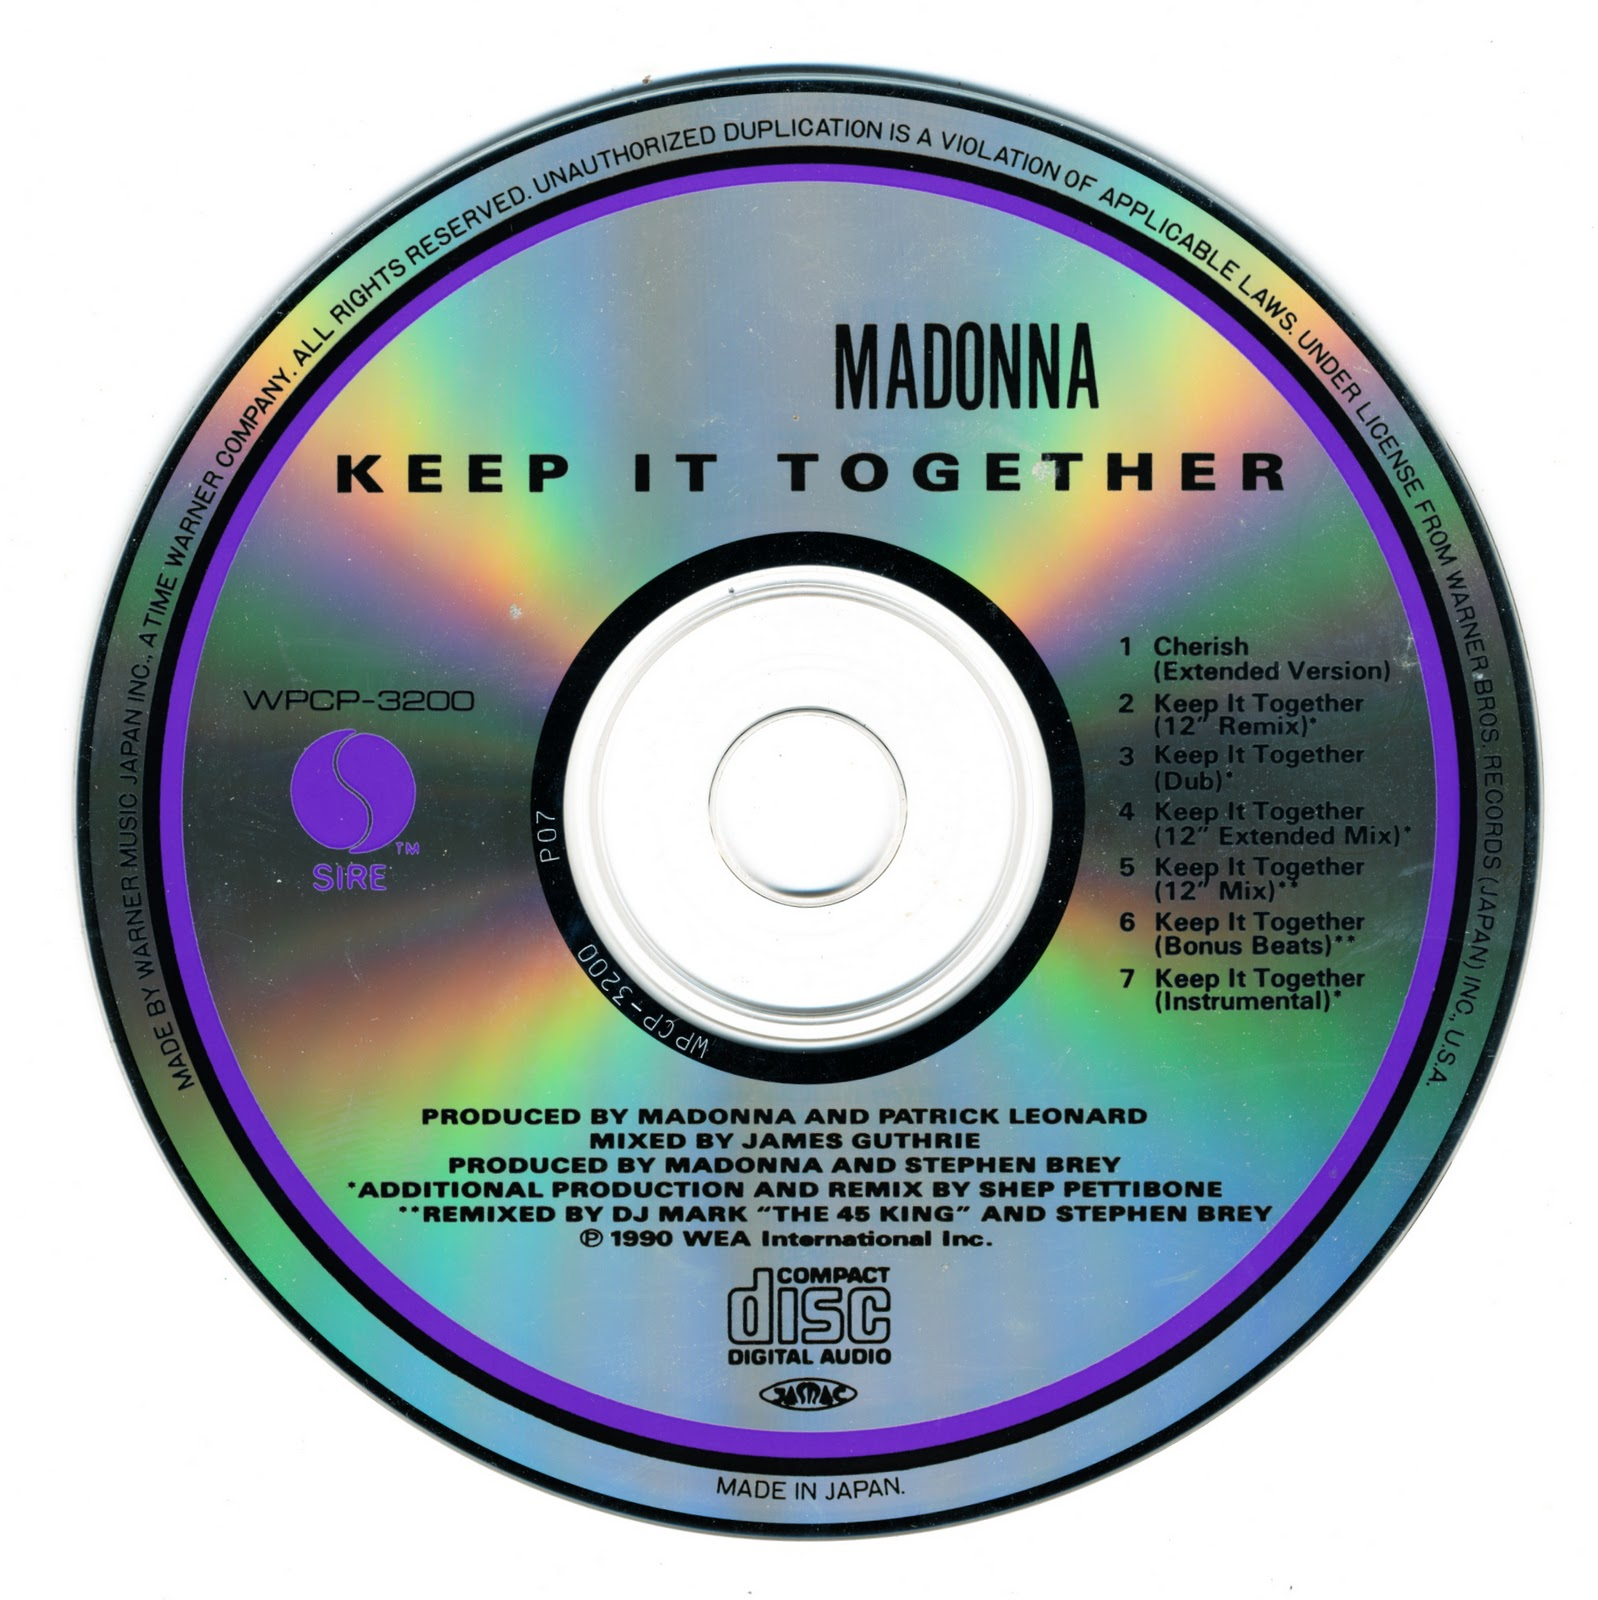 http://4.bp.blogspot.com/-wg__trer6P8/ToN7DFSnG6I/AAAAAAAACd0/4xWWXIQL6vs/s1600/Madonna+KeepCD.jpg